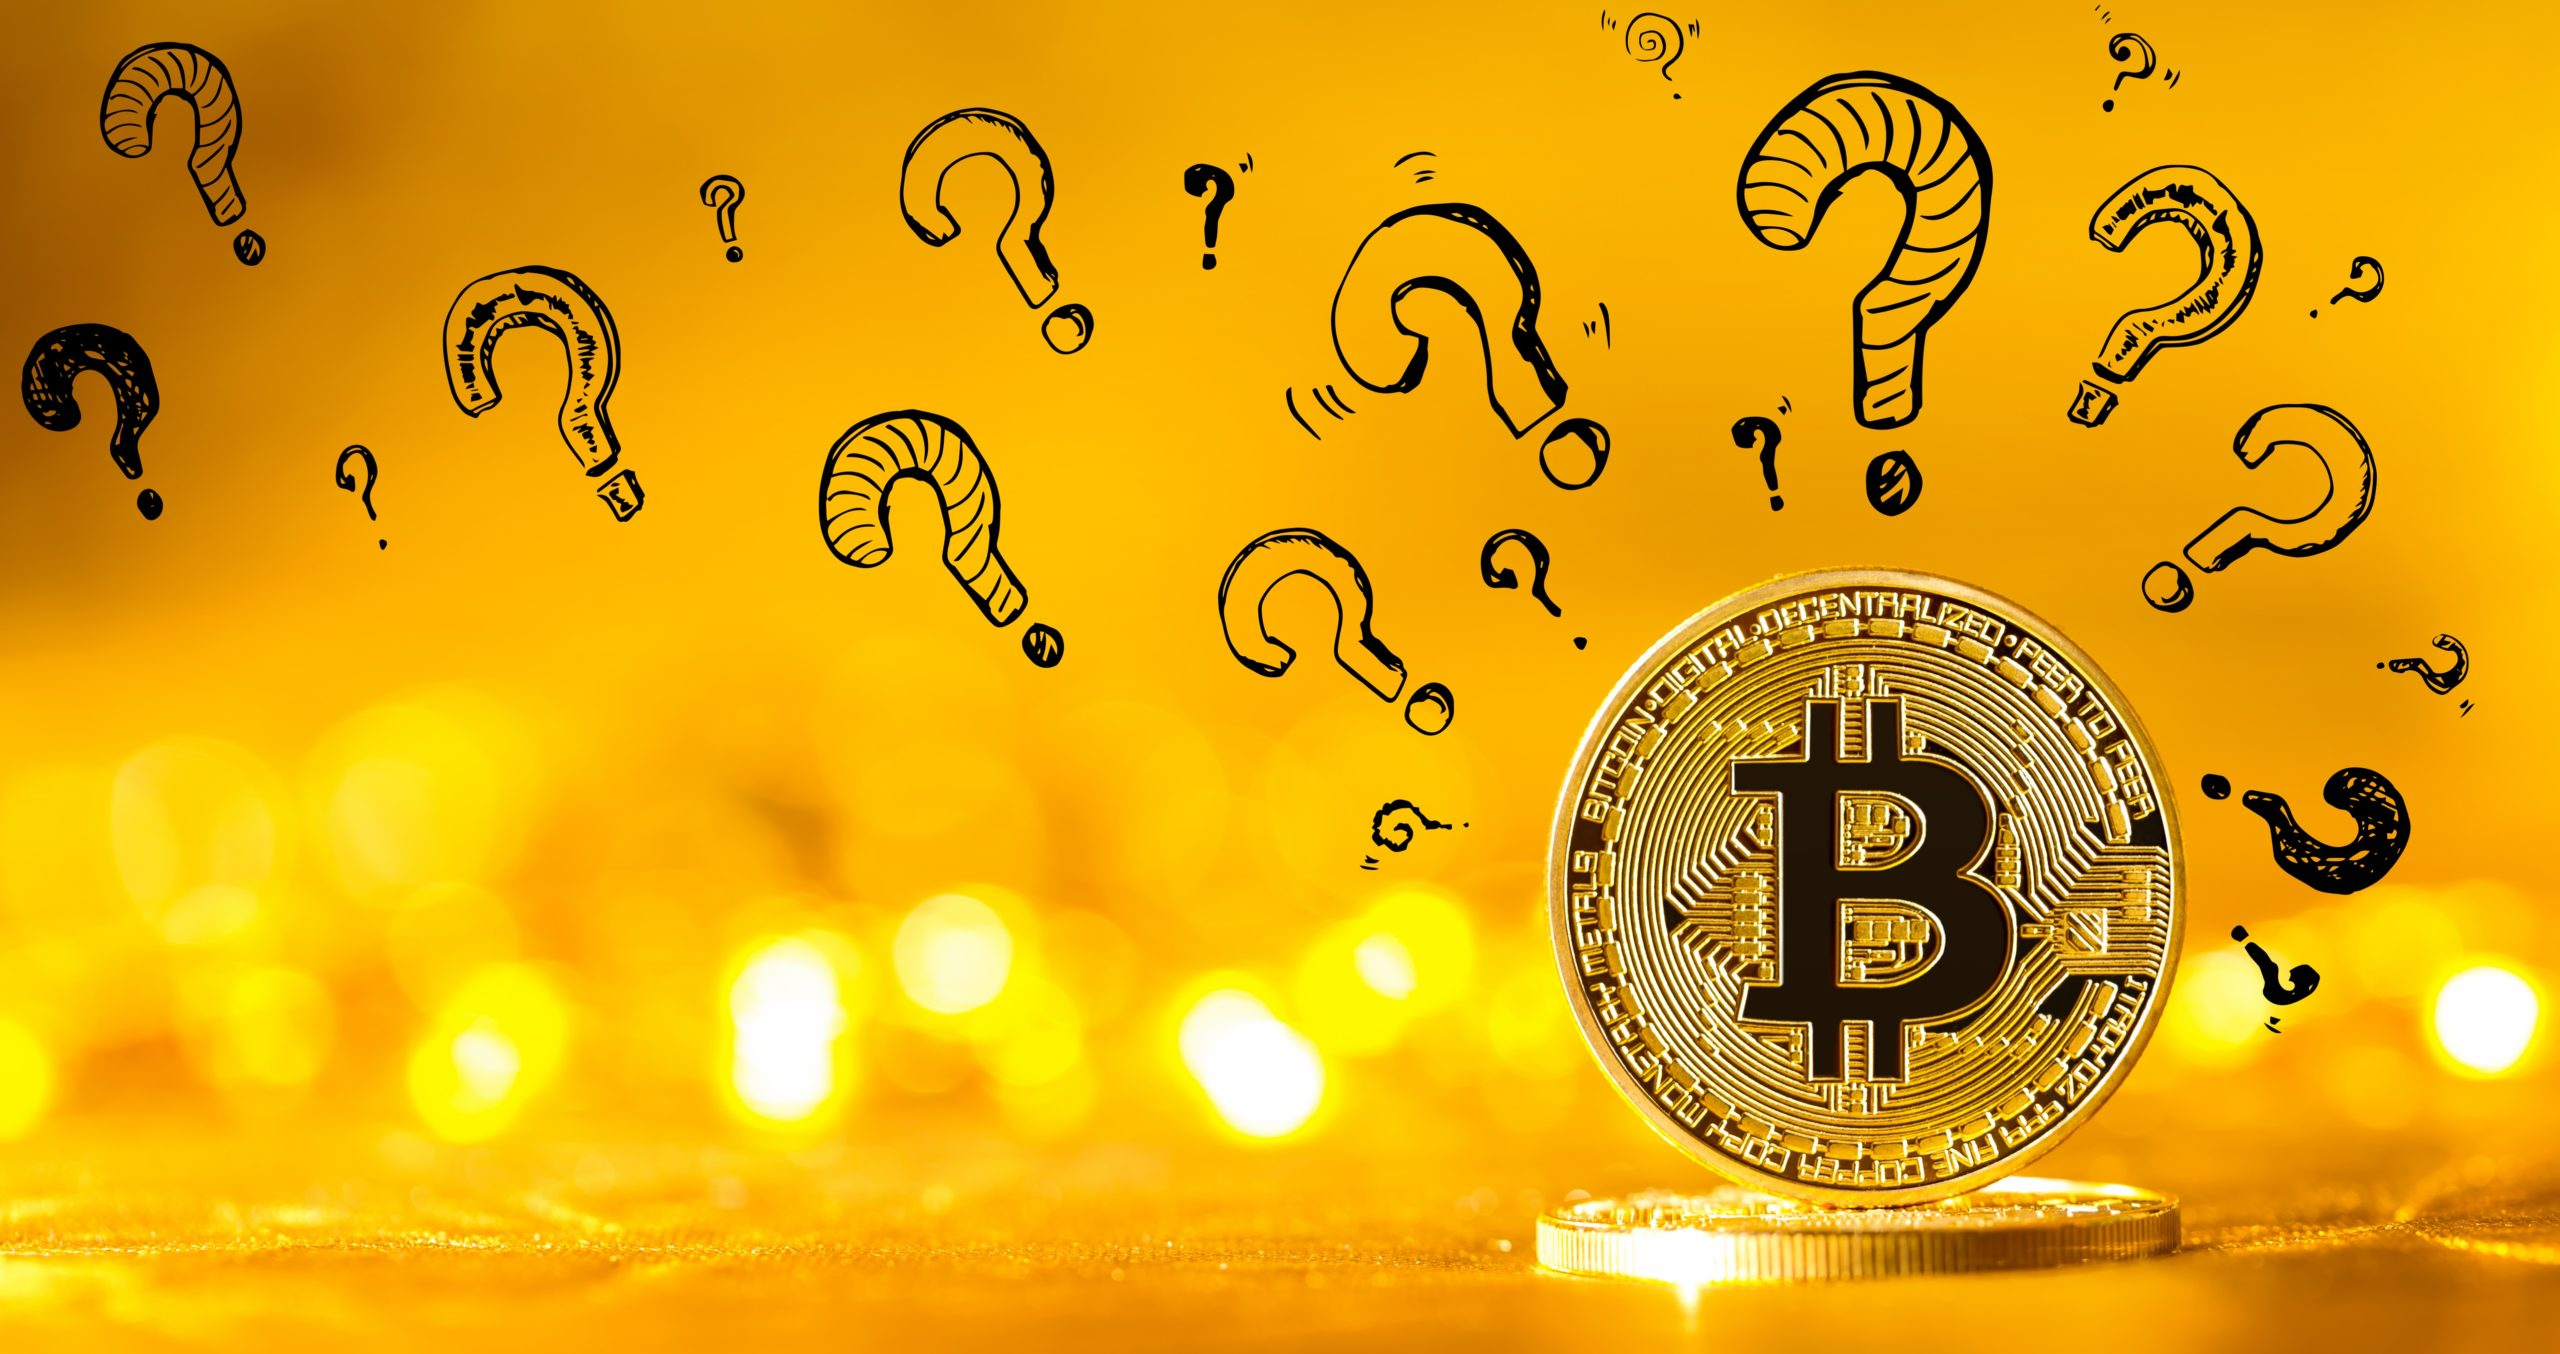 Bitcoin BTC Kisa Vadede 17.000 Dolara Ulasabilir Mi scaled